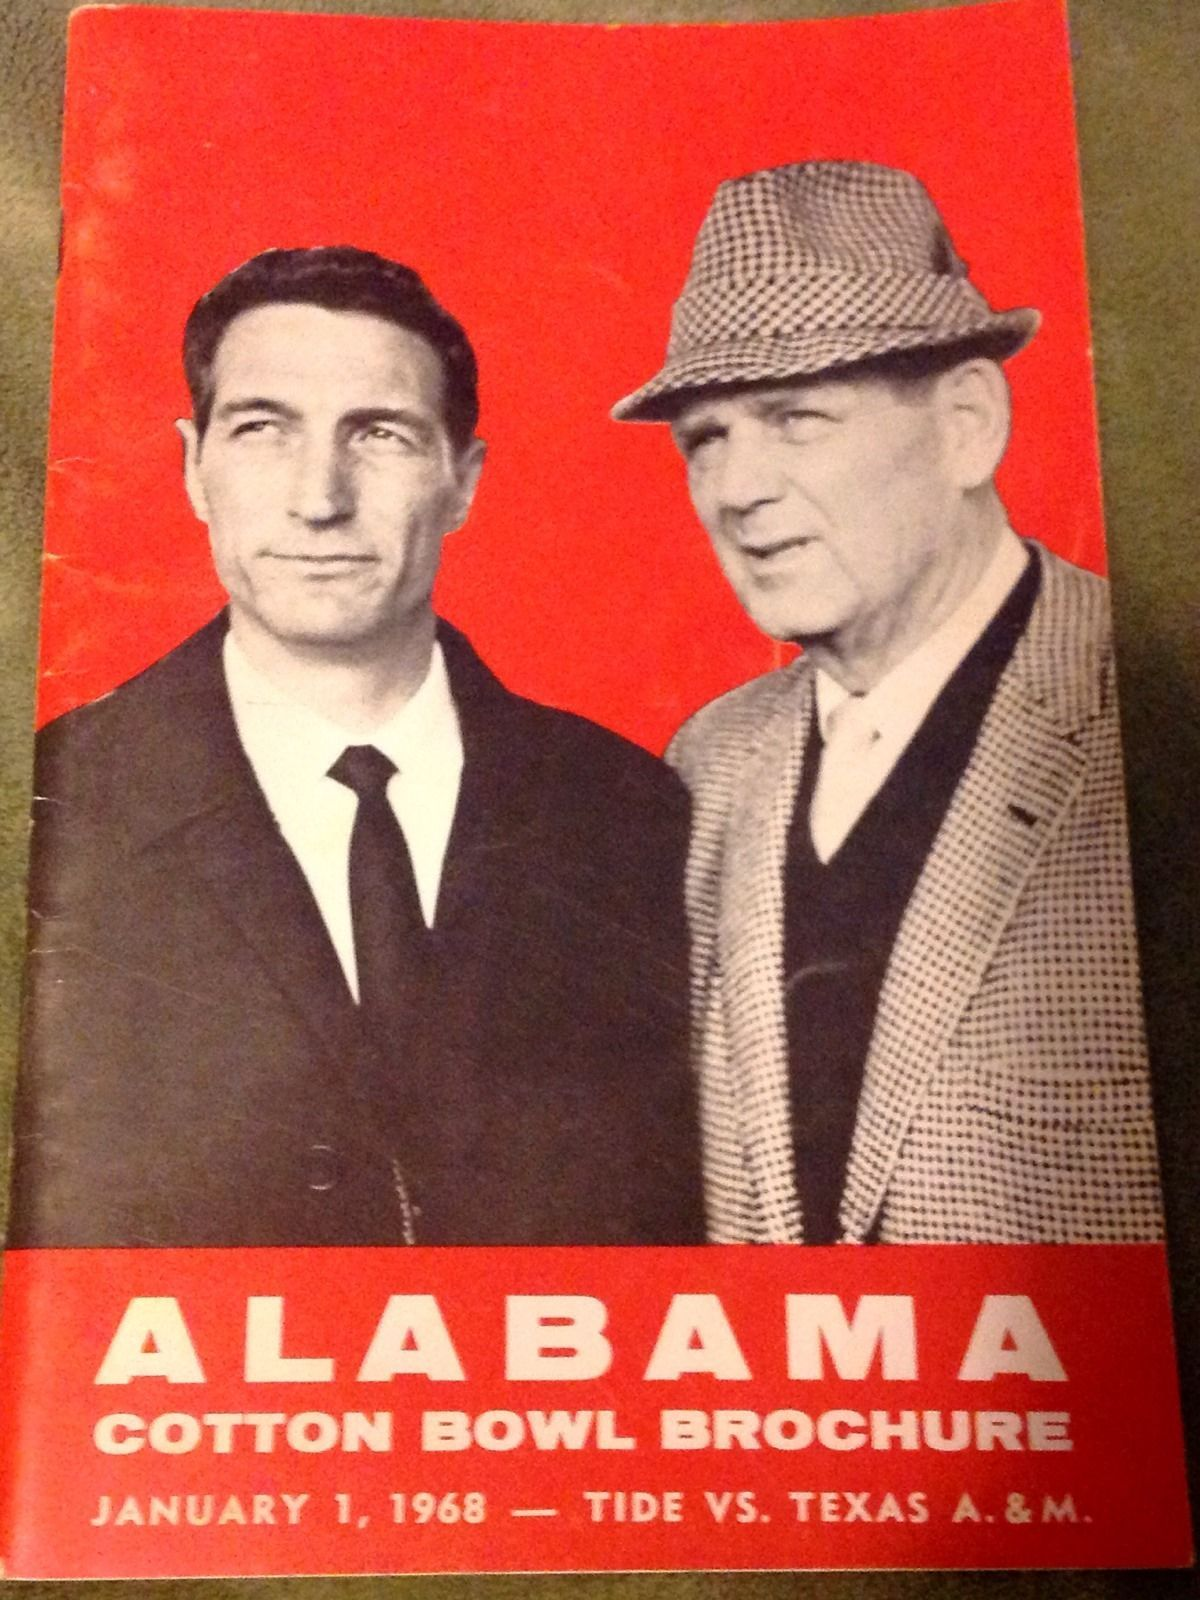 Alabama brochure for the 1968 Alabama vs Texas AM Cotton